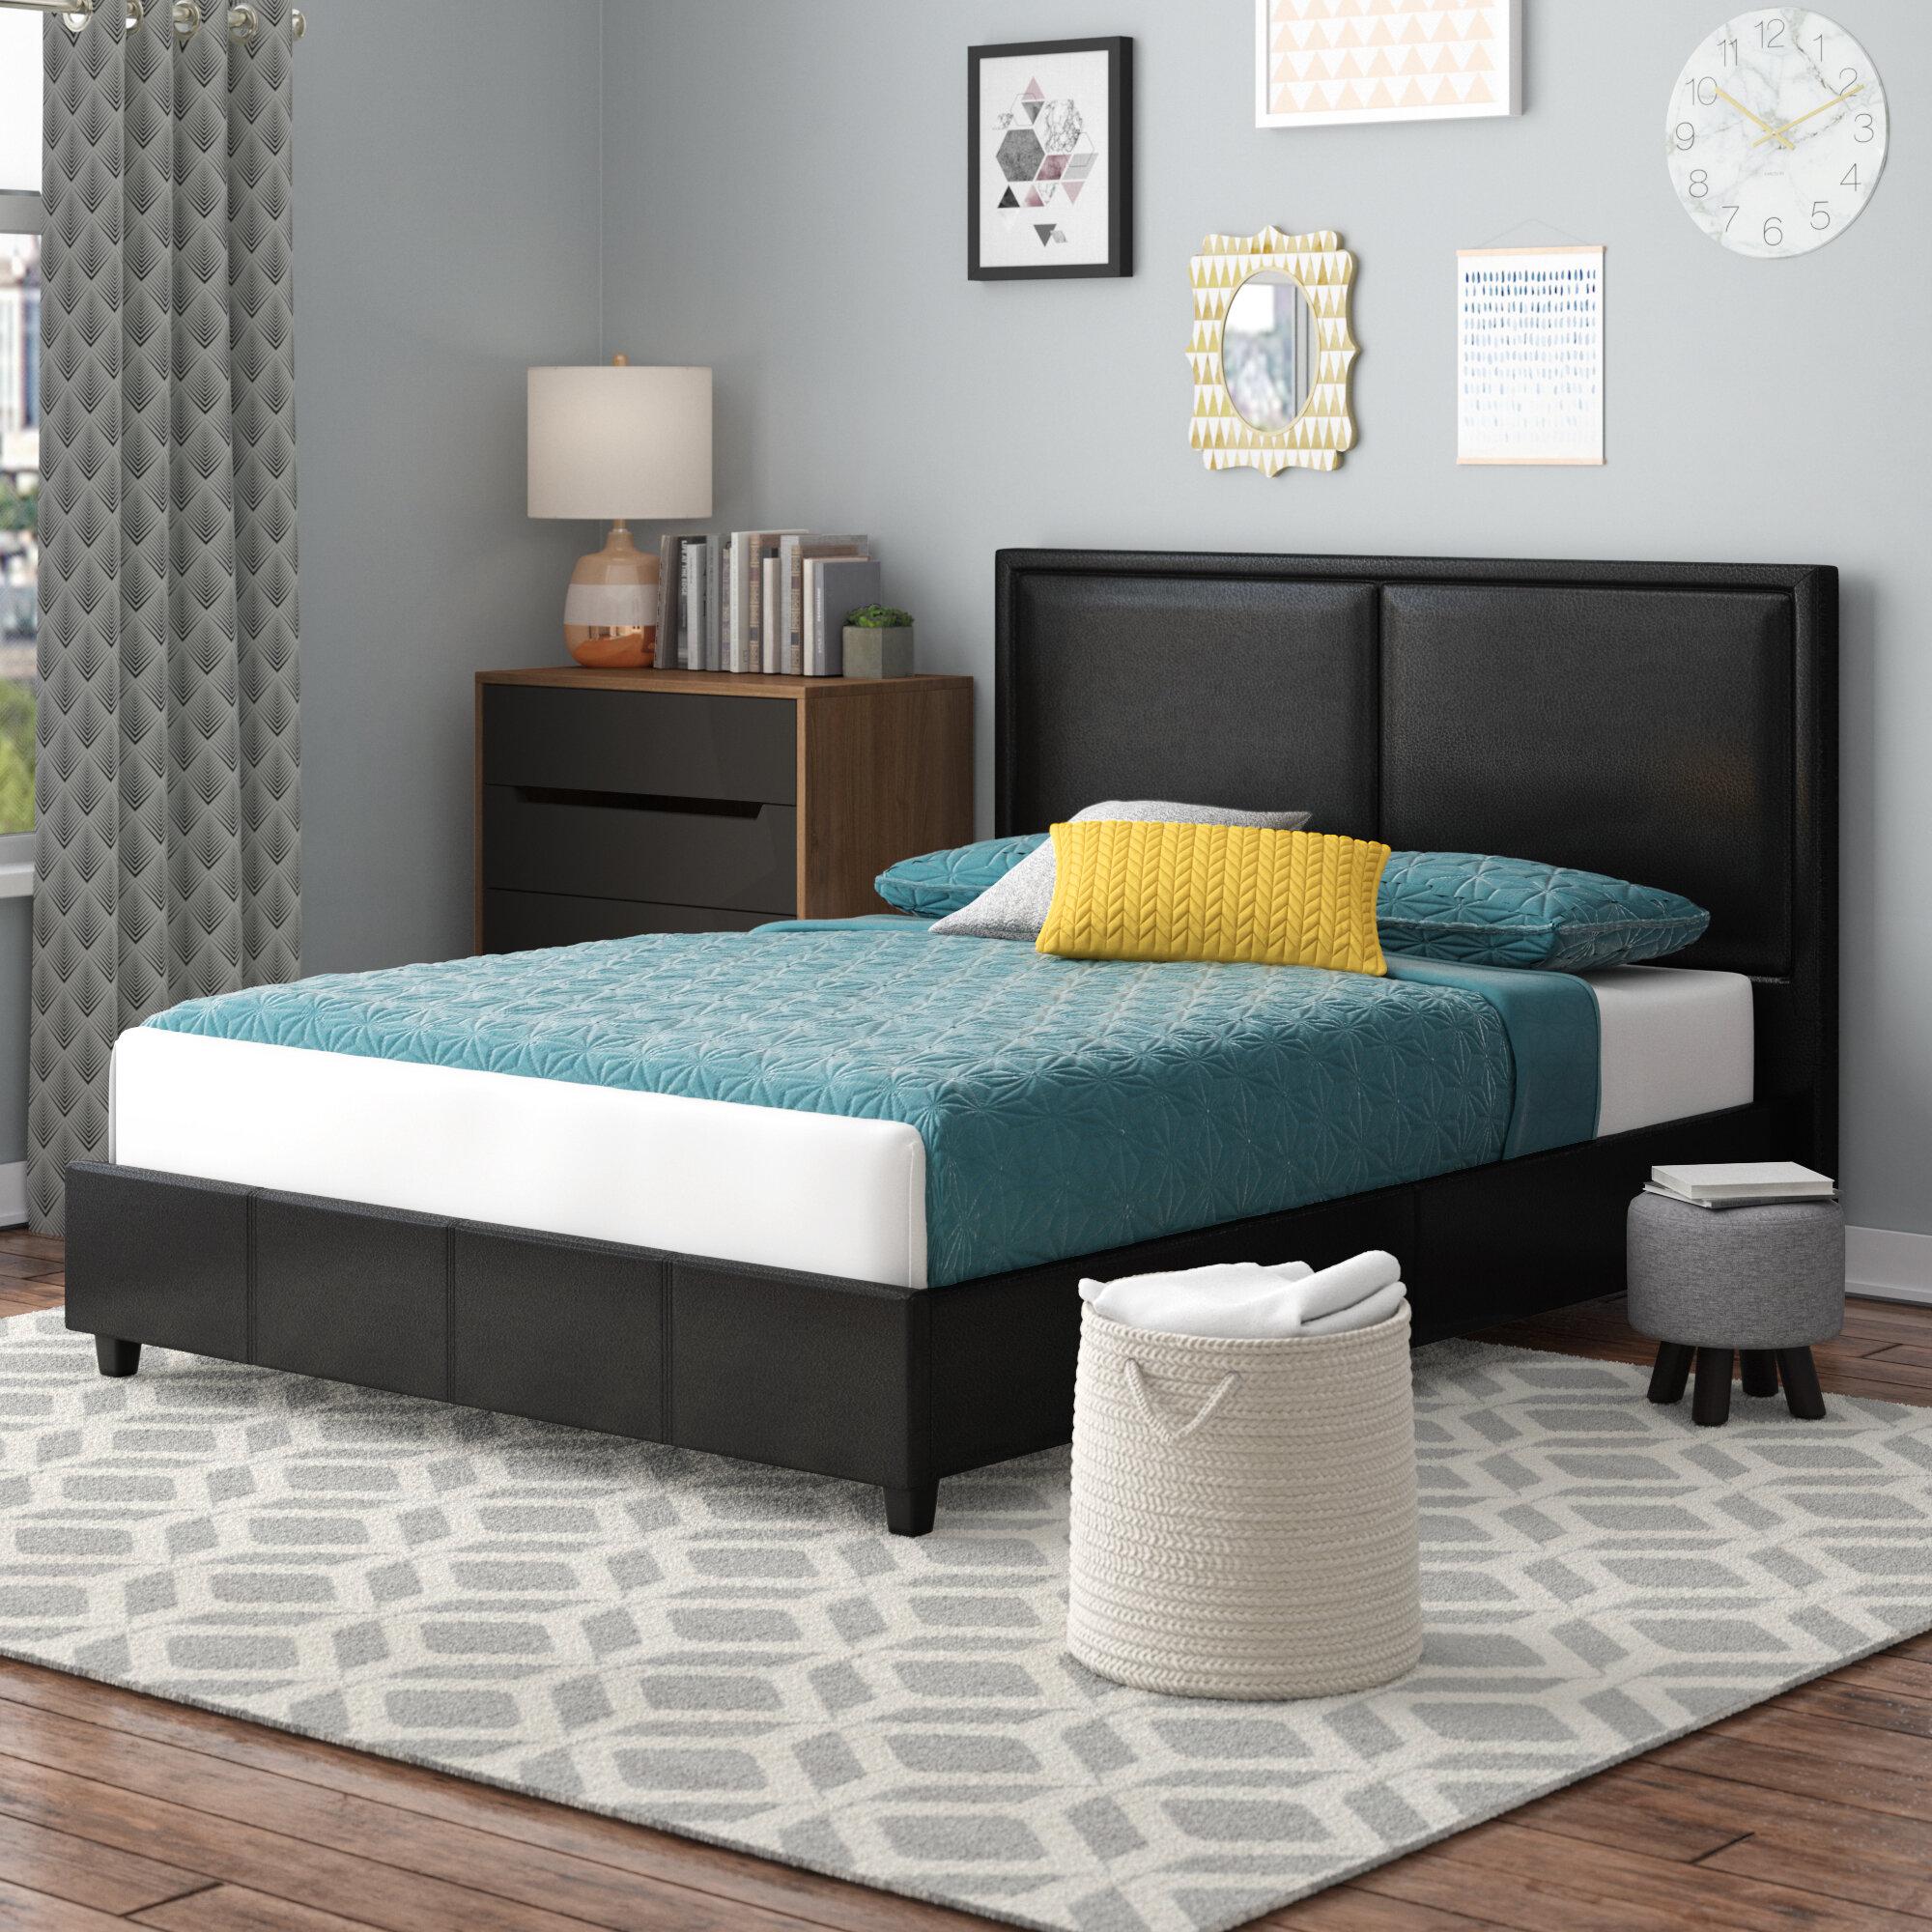 Wade Logan Alvin Upholstered Platform Bed Reviews Wayfair - Logan-leather-bed-with-adjustable-headboard